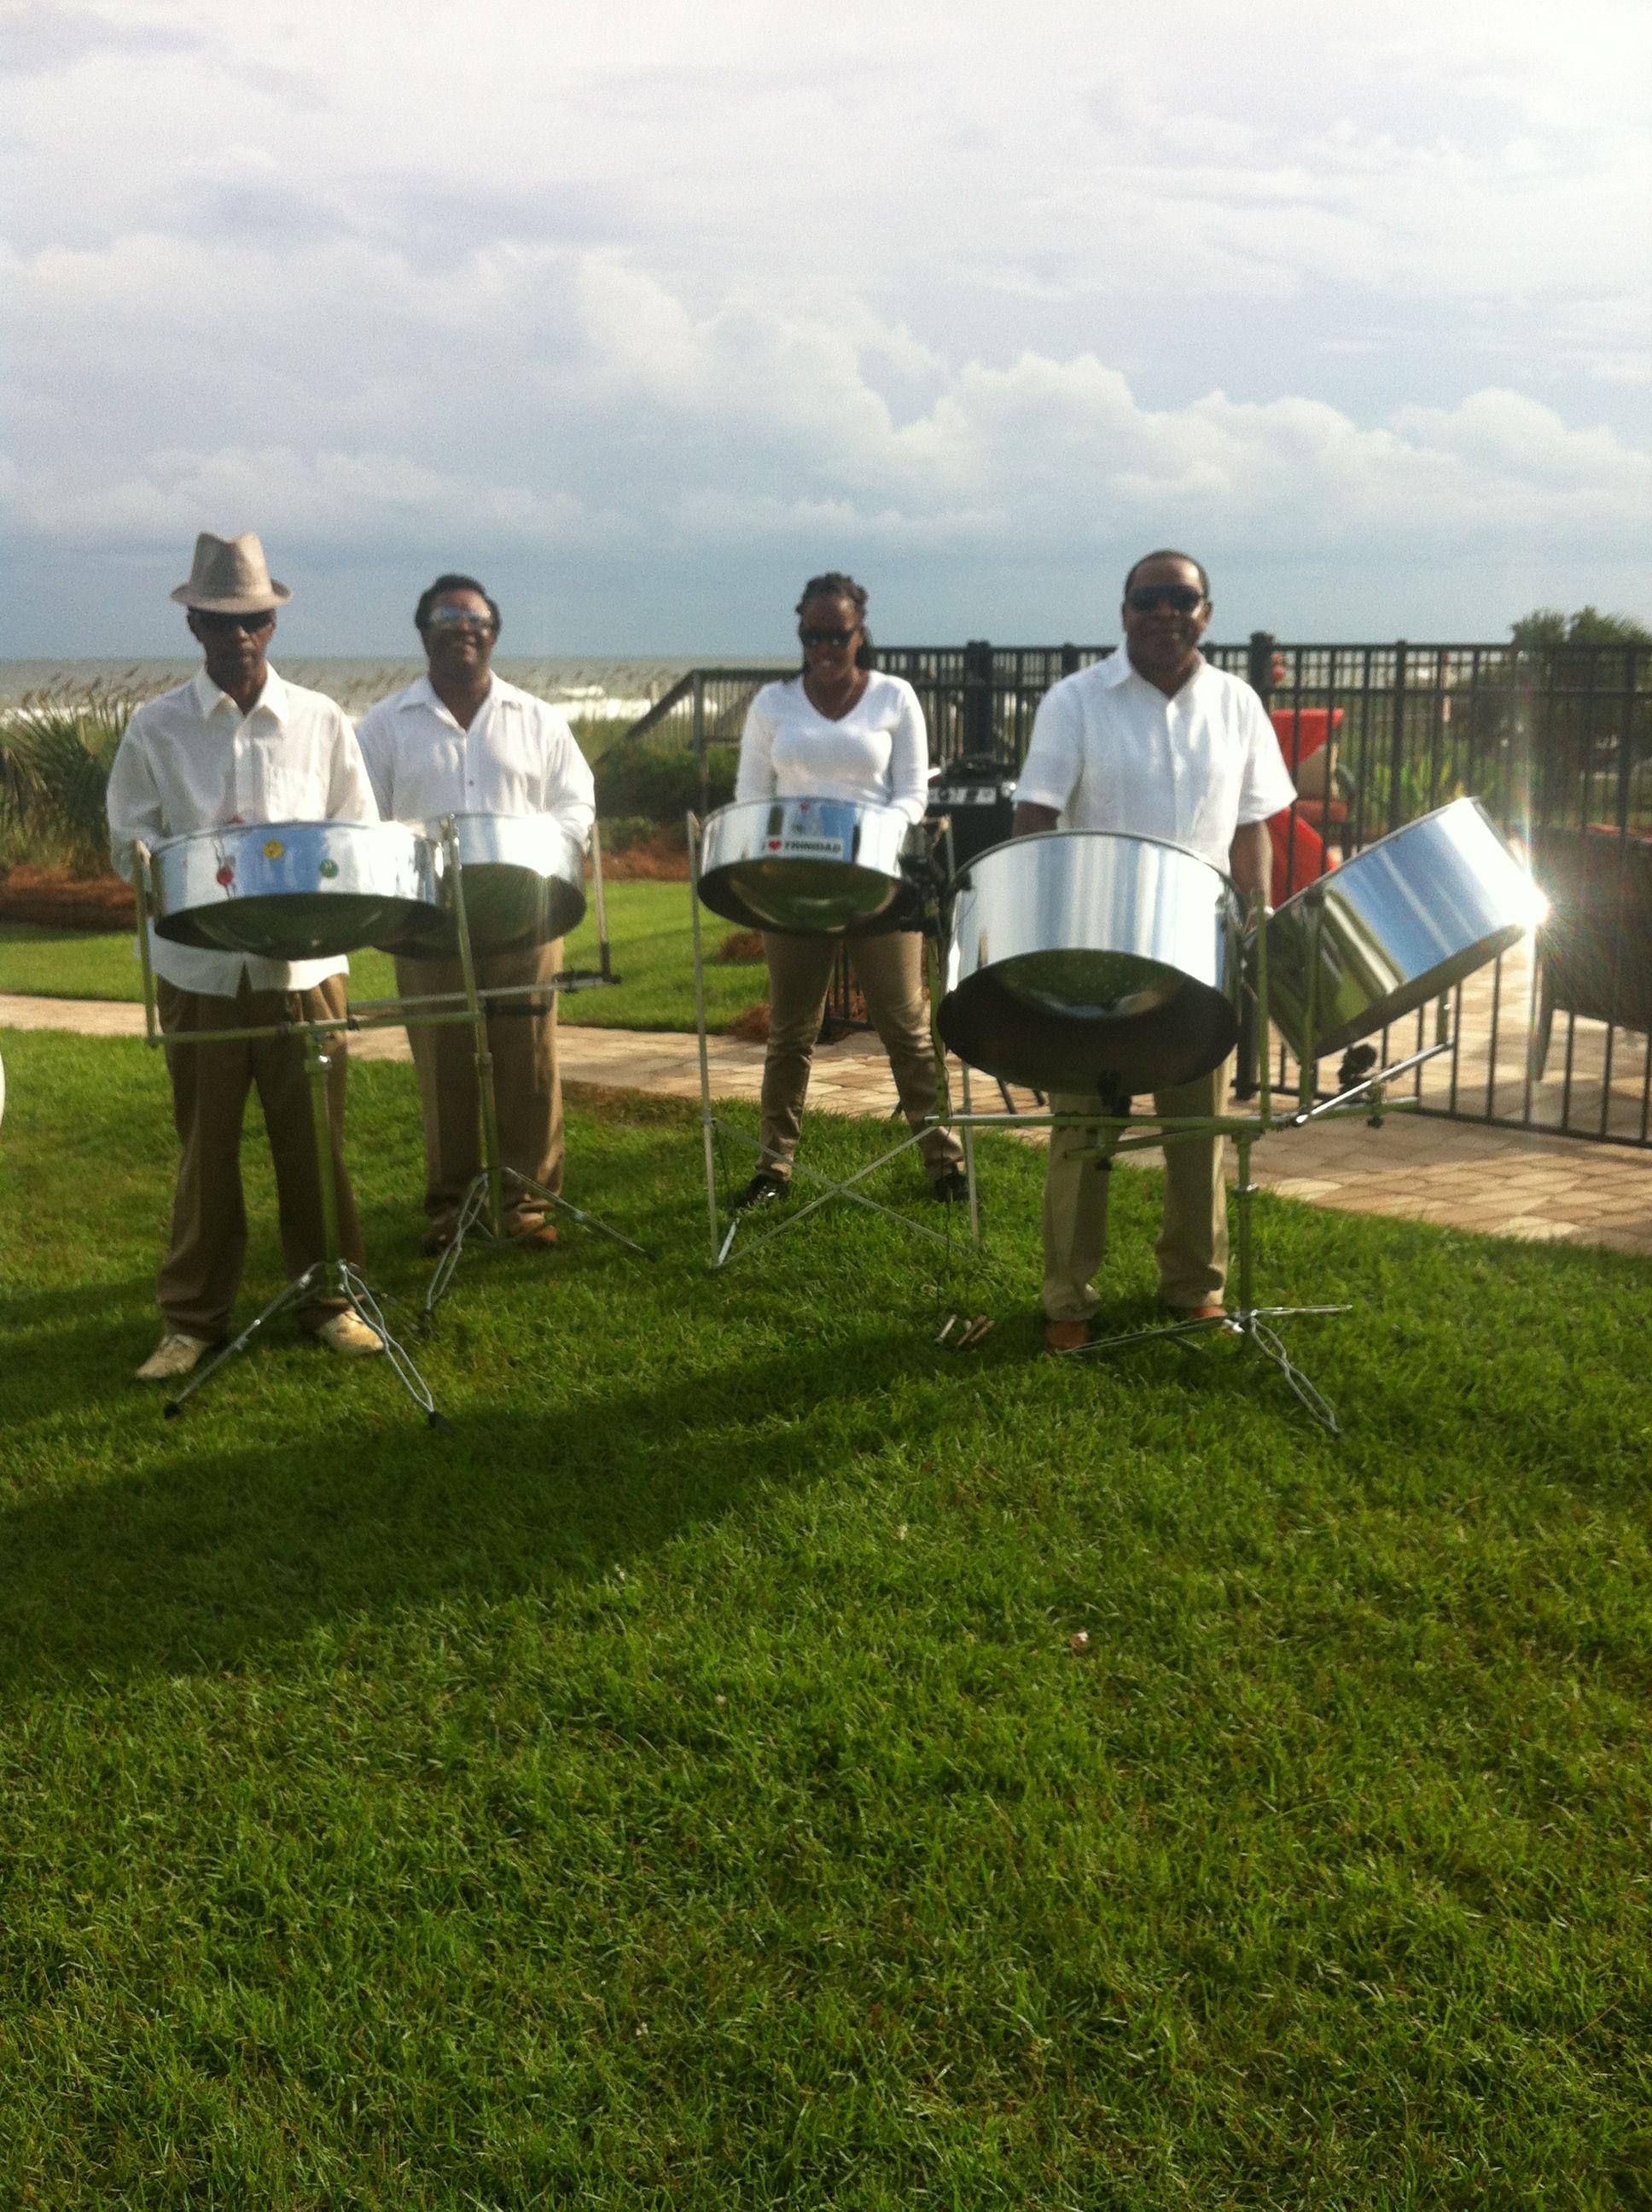 Steel Drum Band Melbourne, FL - RythmTrail Hire steel drum